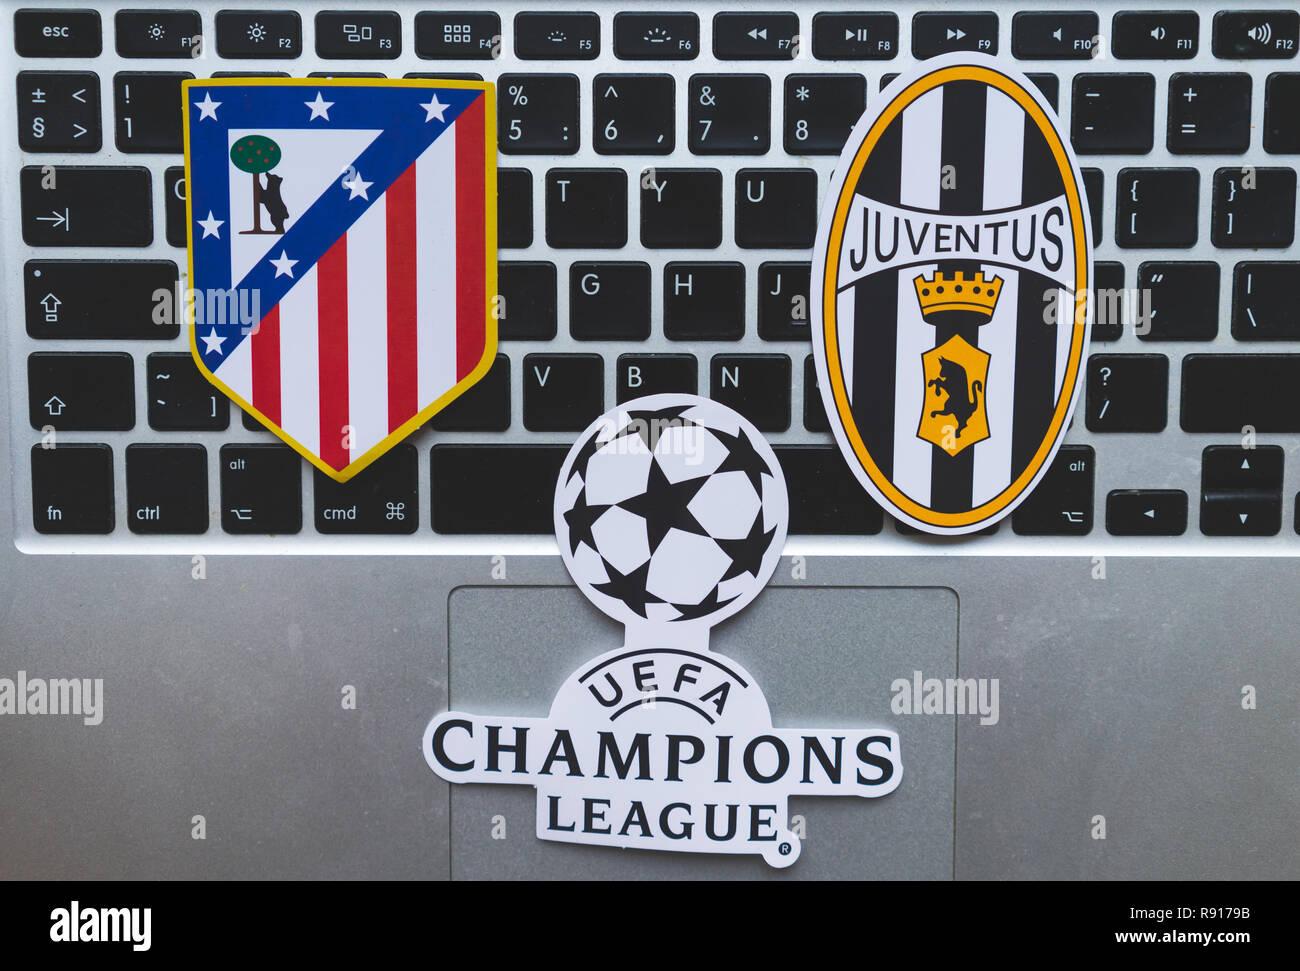 Juventus Team 2019 Stock Photos & Juventus Team 2019 Stock